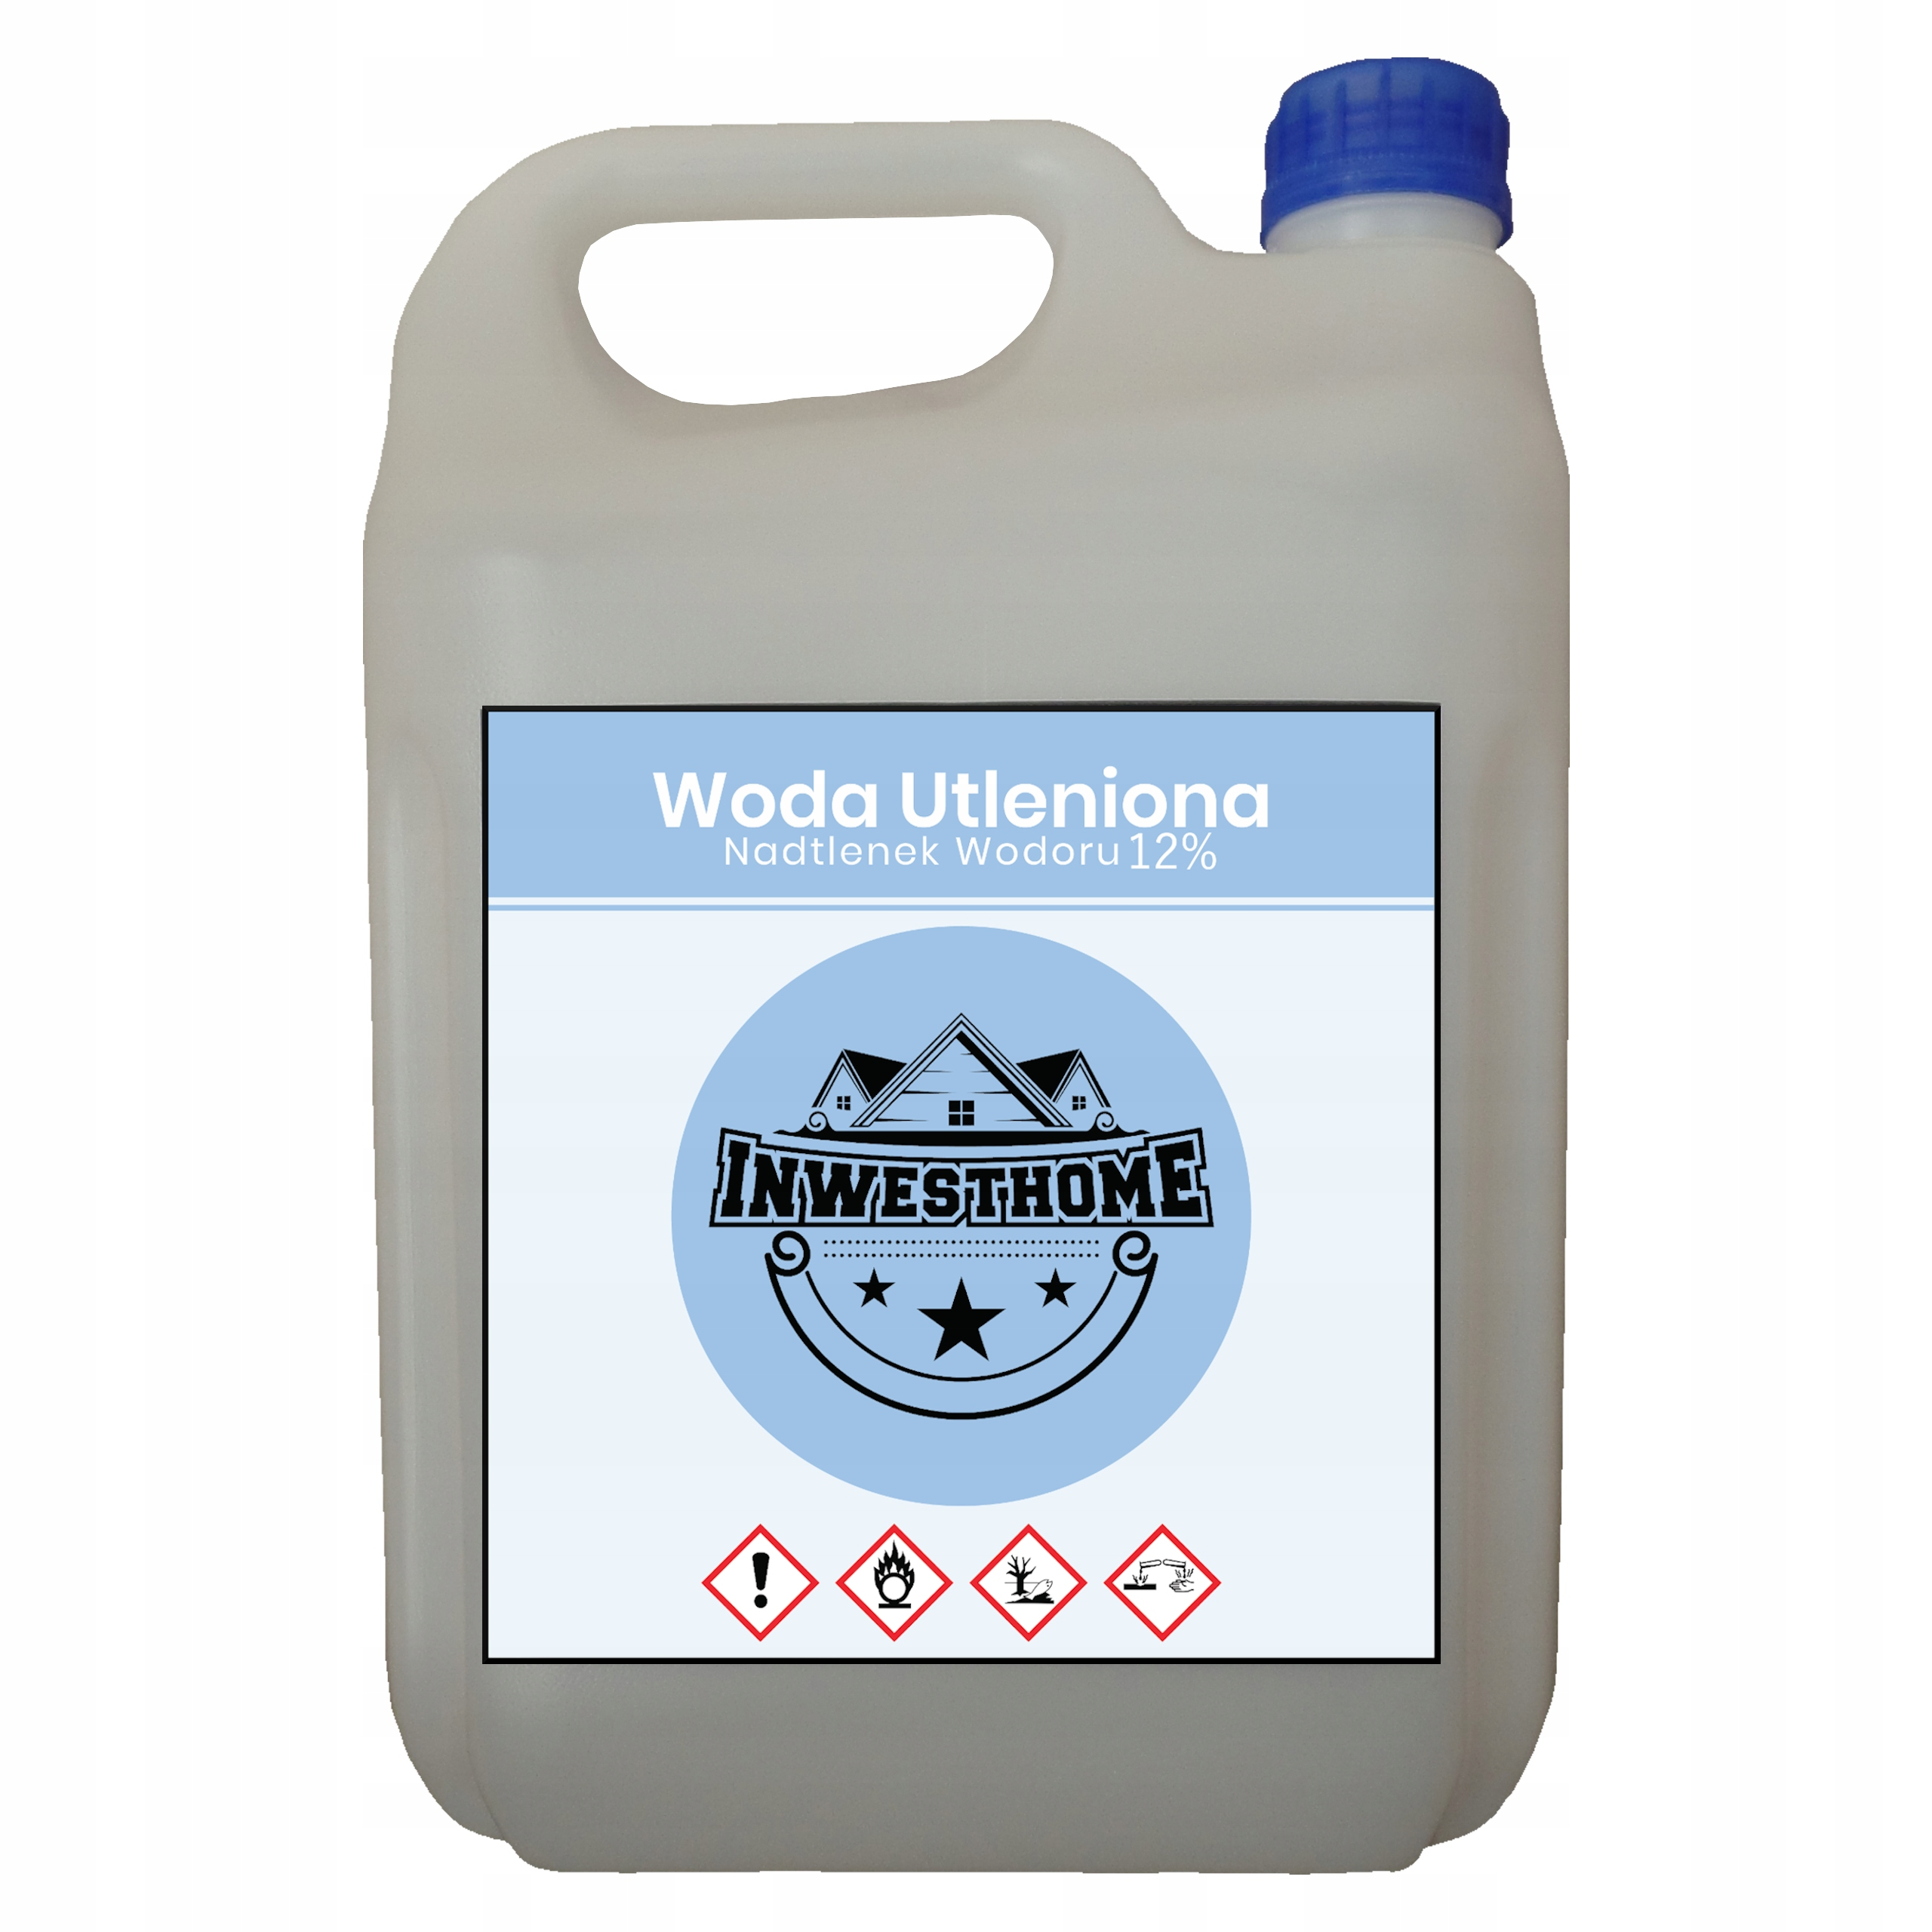 WODA UTLENIONA 12% NADTLENEK WODORU 5L